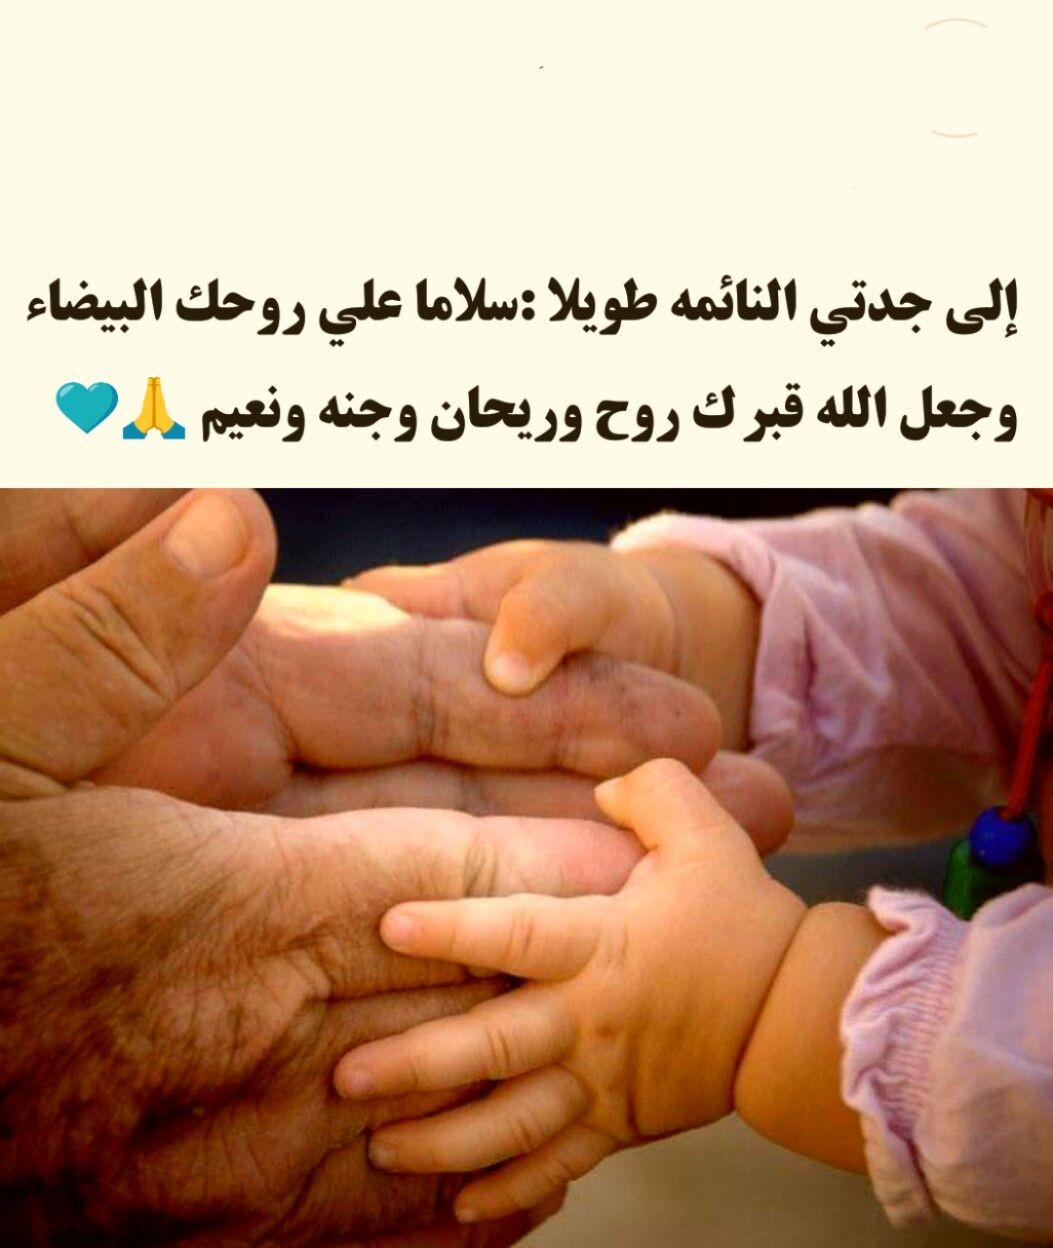 جدي حبيبي Islam Facts Words Quotes Wallpaper Bible